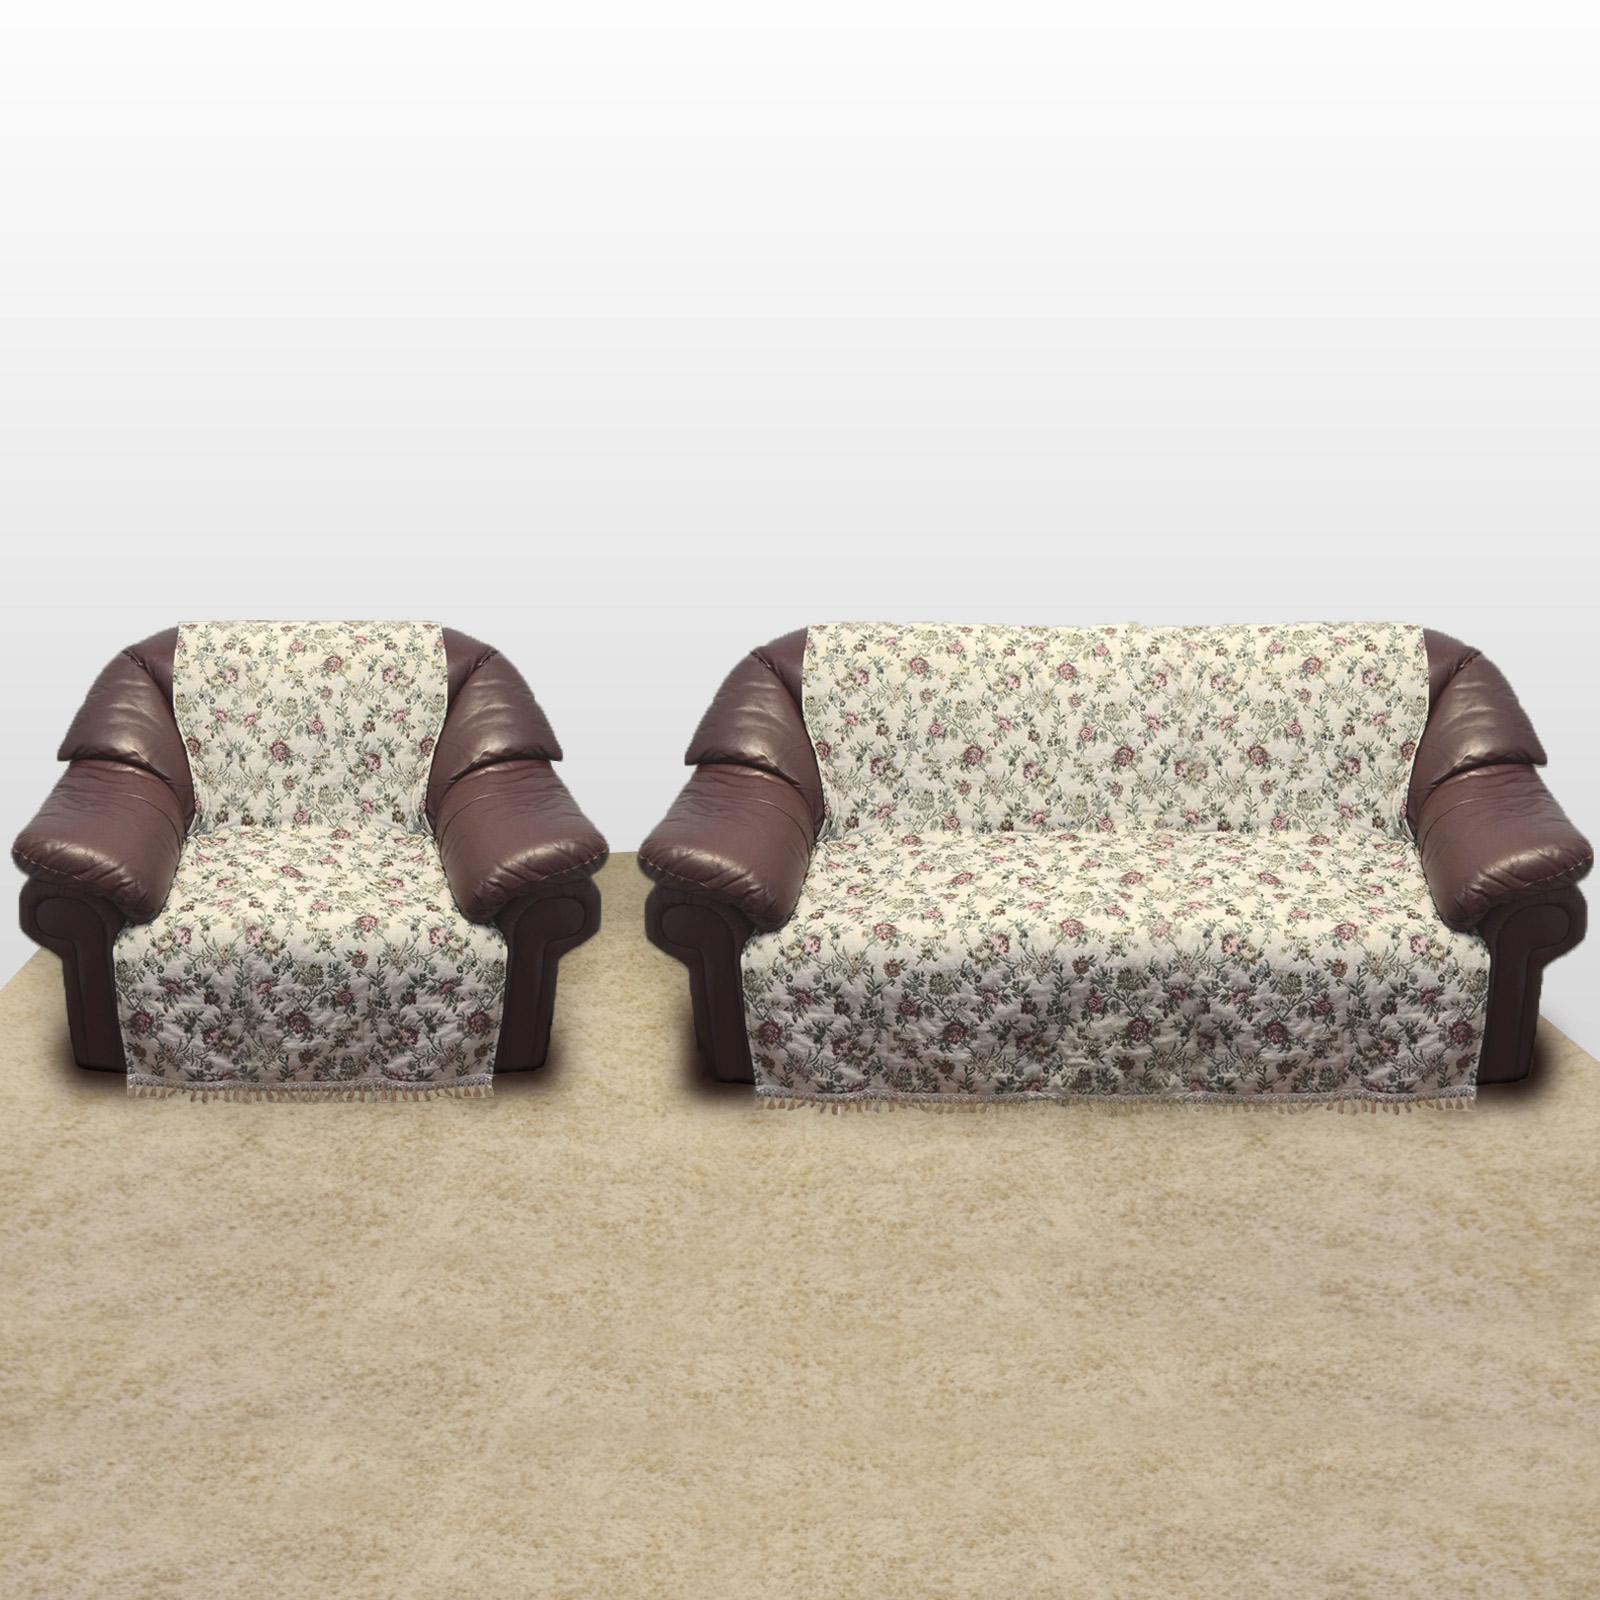 Набор накидок на мебель «Элегантный жаккард»